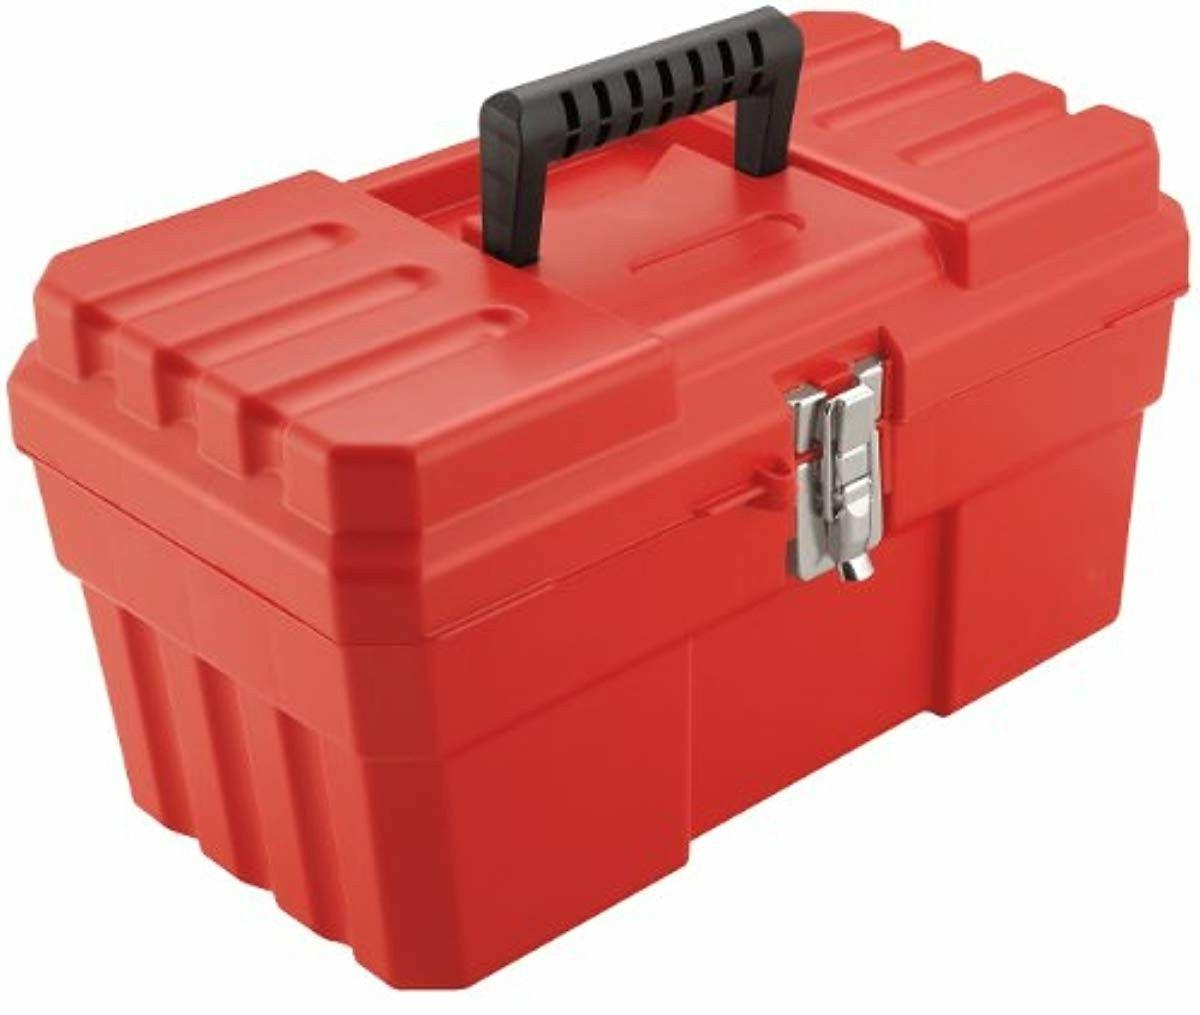 akro mils 9514 14 inch probox plastic